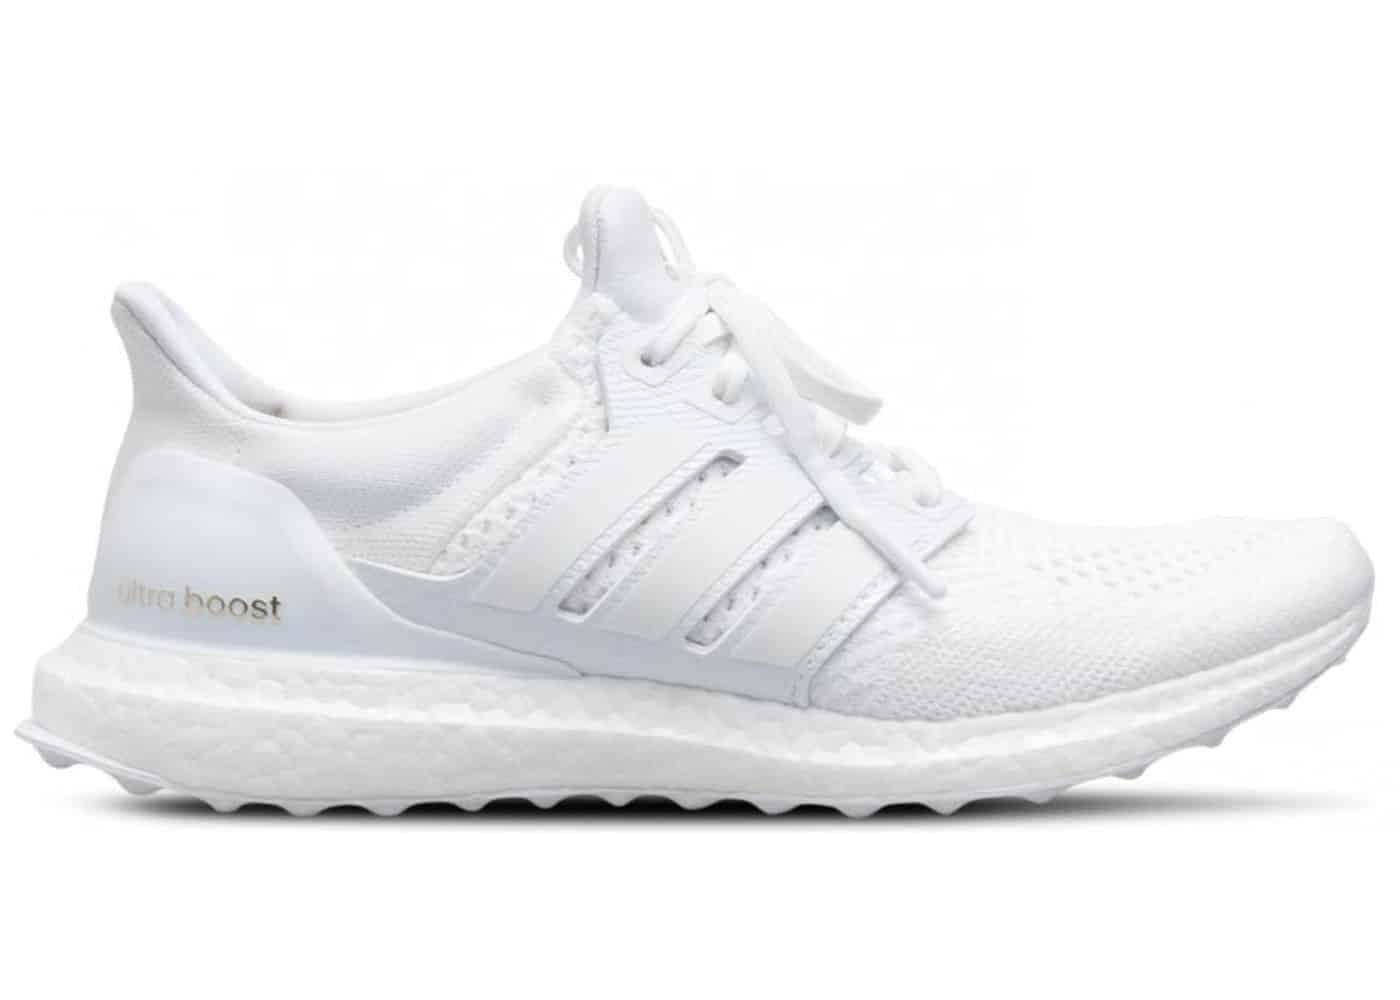 adidas UltraBOOST 1.0 « Triple White » un restock prévu BLOW